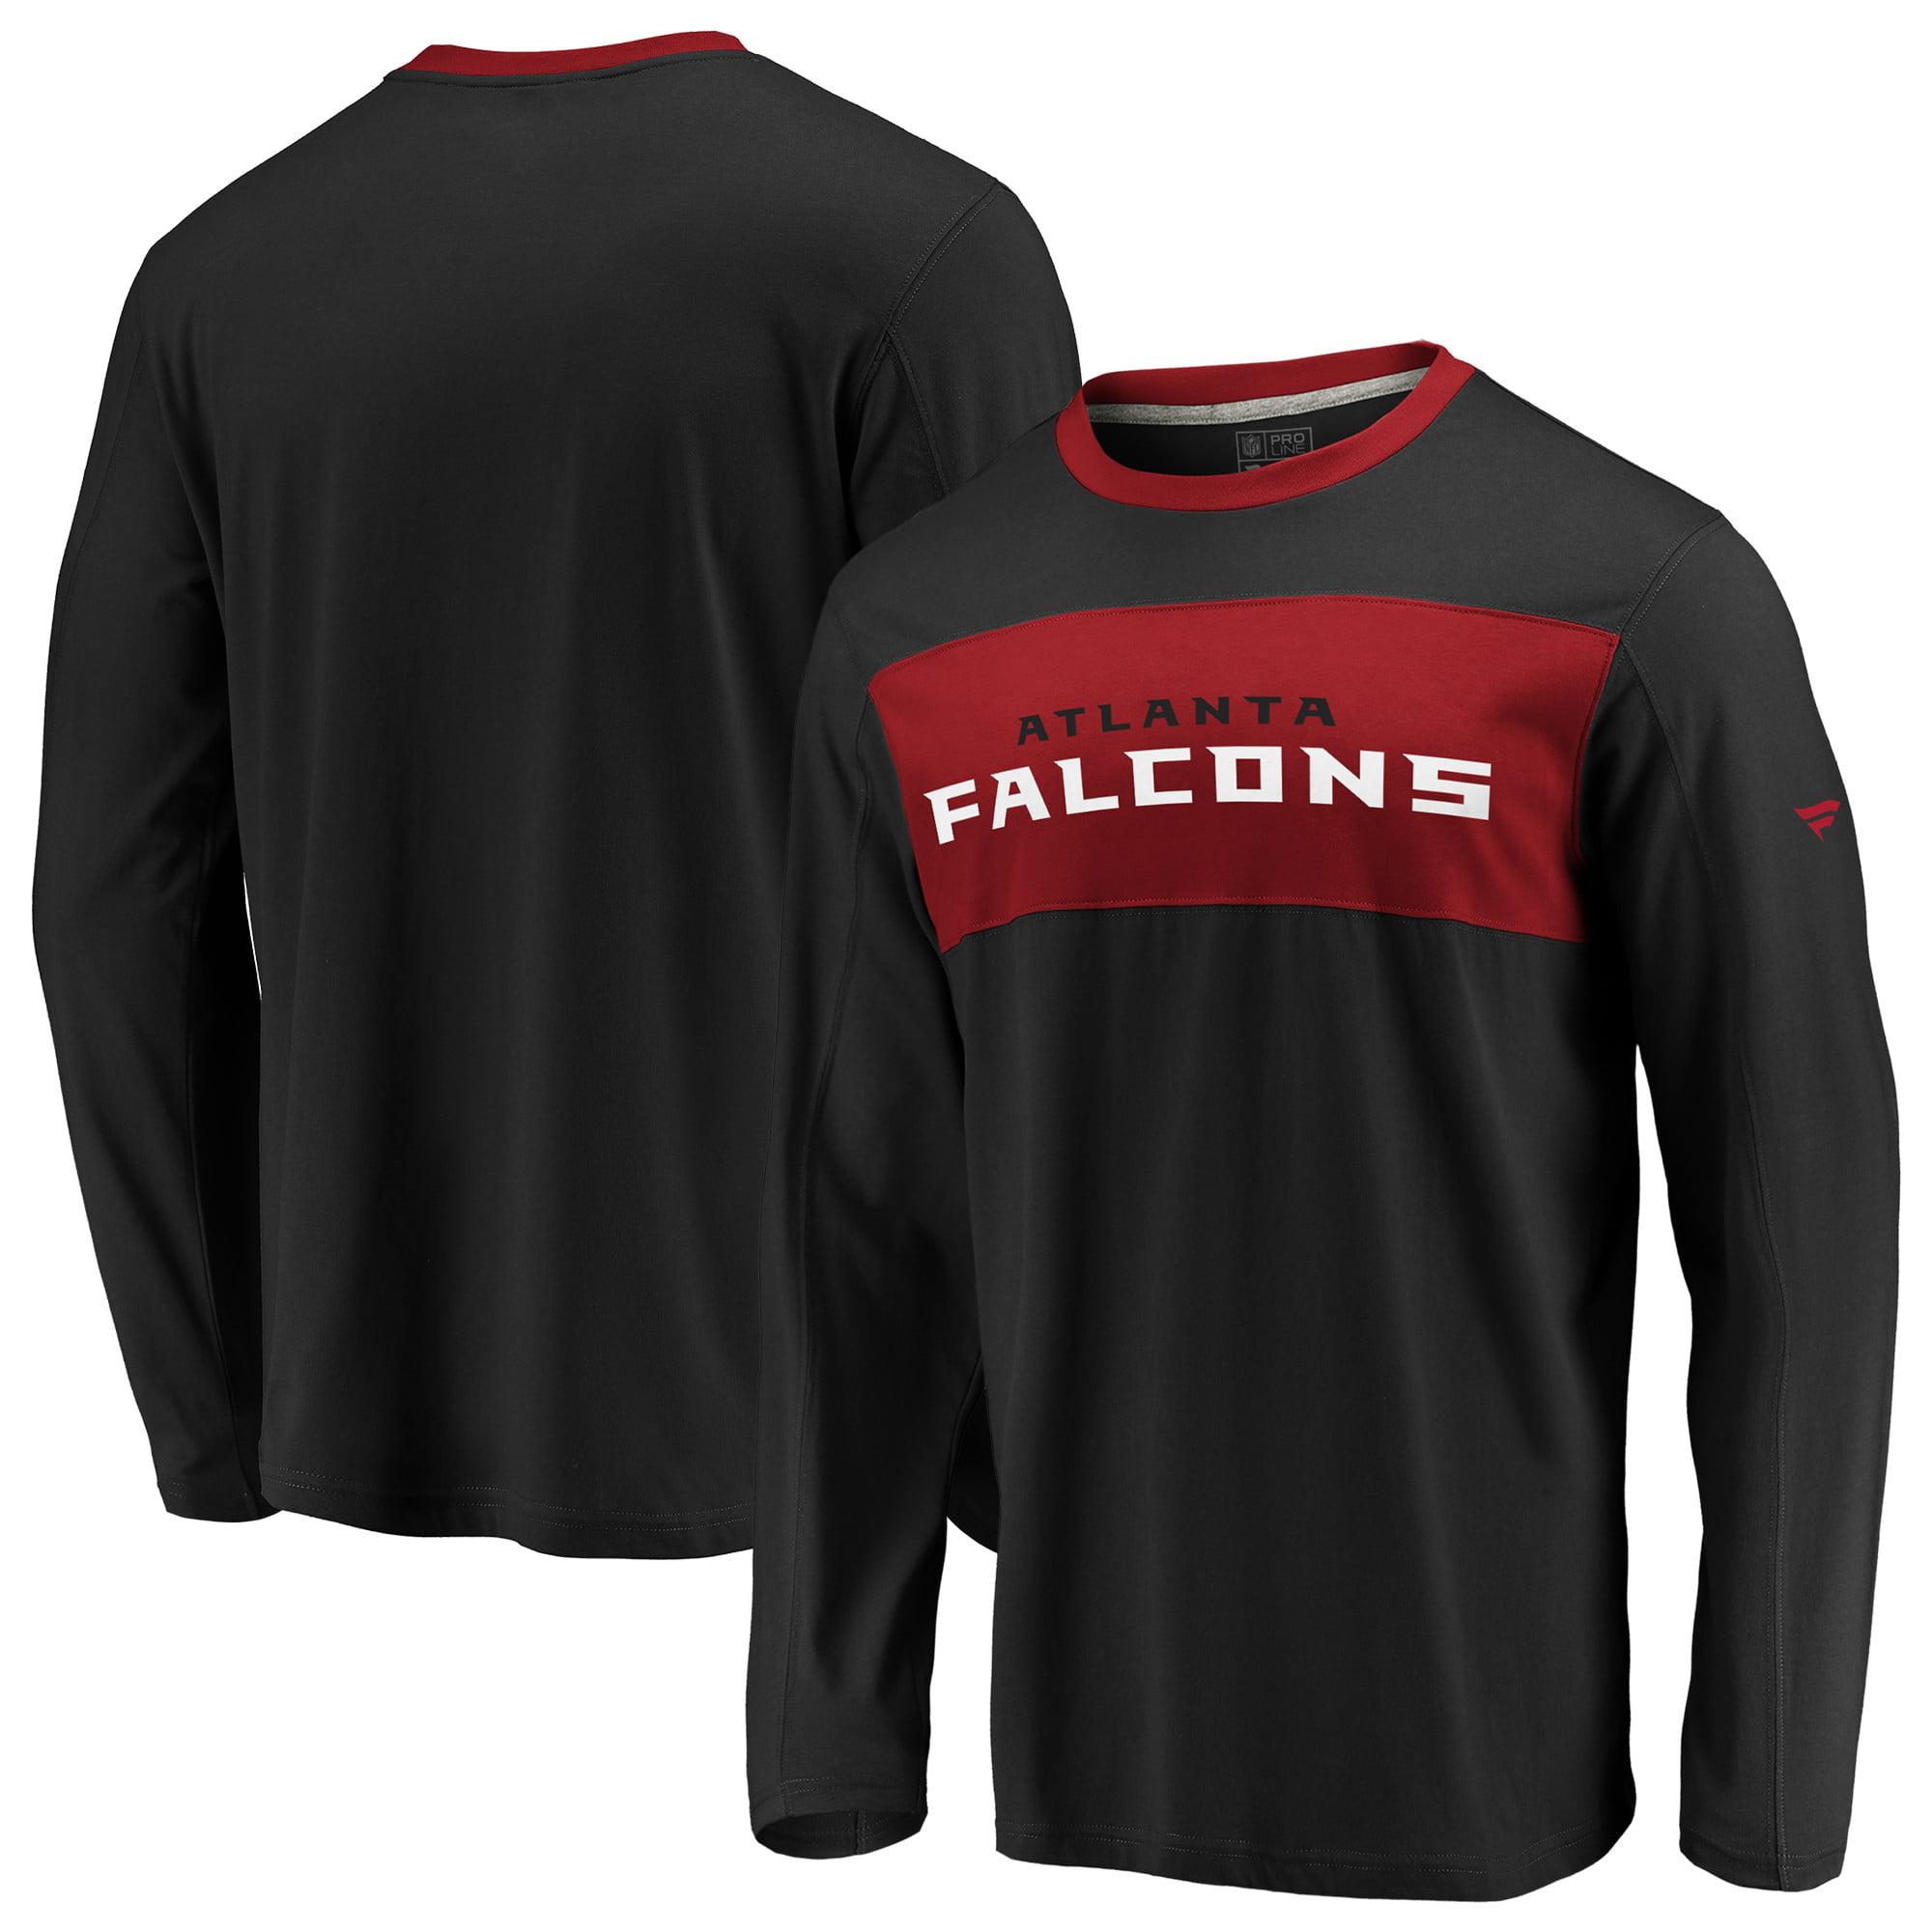 Atlanta Falcons NFL Pro Line by Fanatics Branded Long Sleeve Iconic T-Shirt - Black